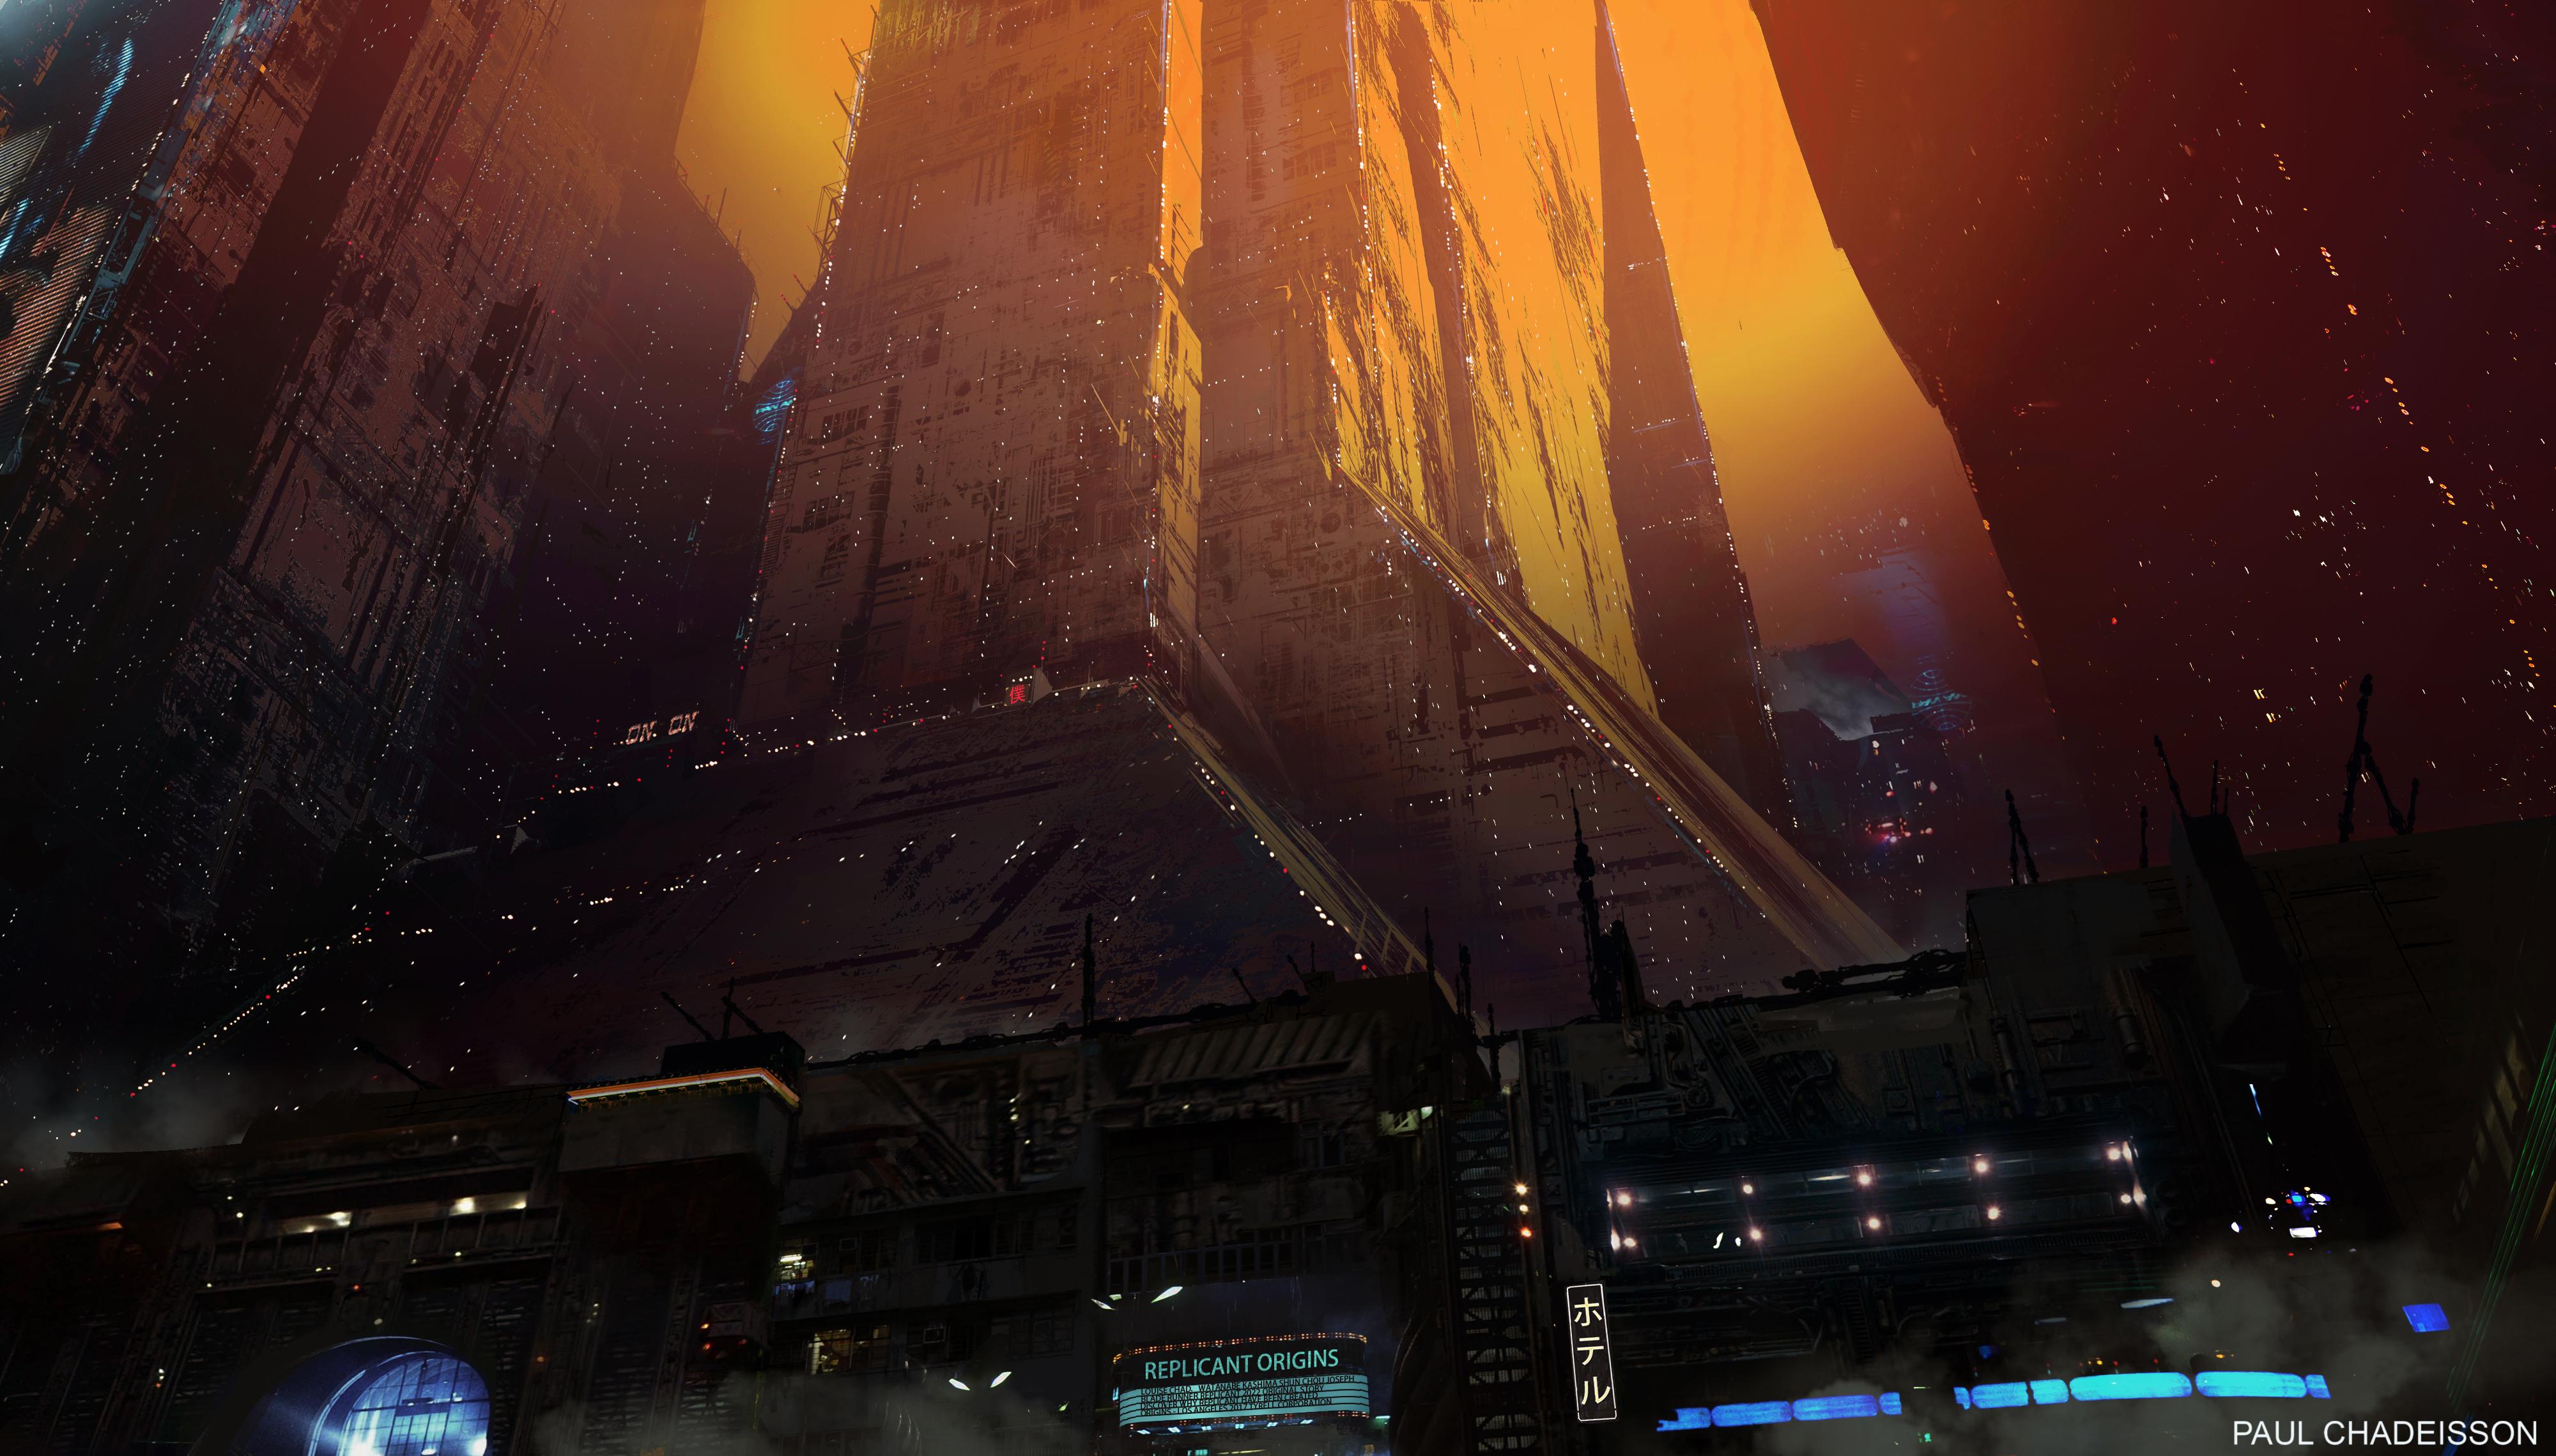 Blade Runner 2049 4k Ultra HD Wallpaper | Background Image ...